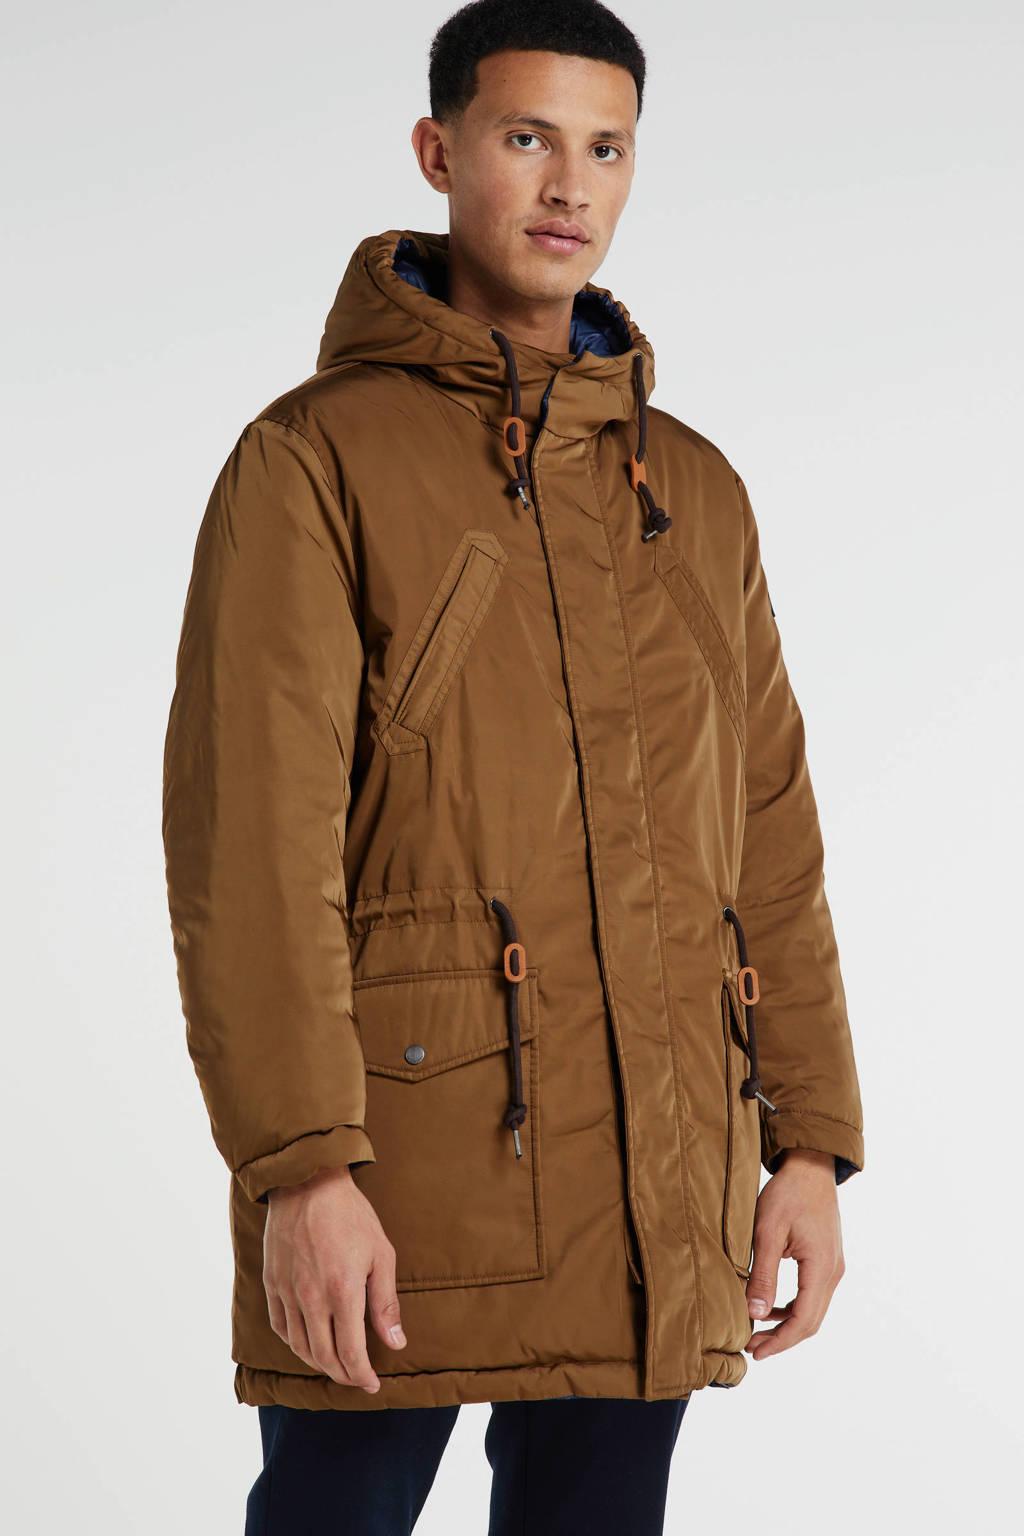 Pepe Jeans reversible jas bruin/donkerblauw, Bruin/donkerblauw